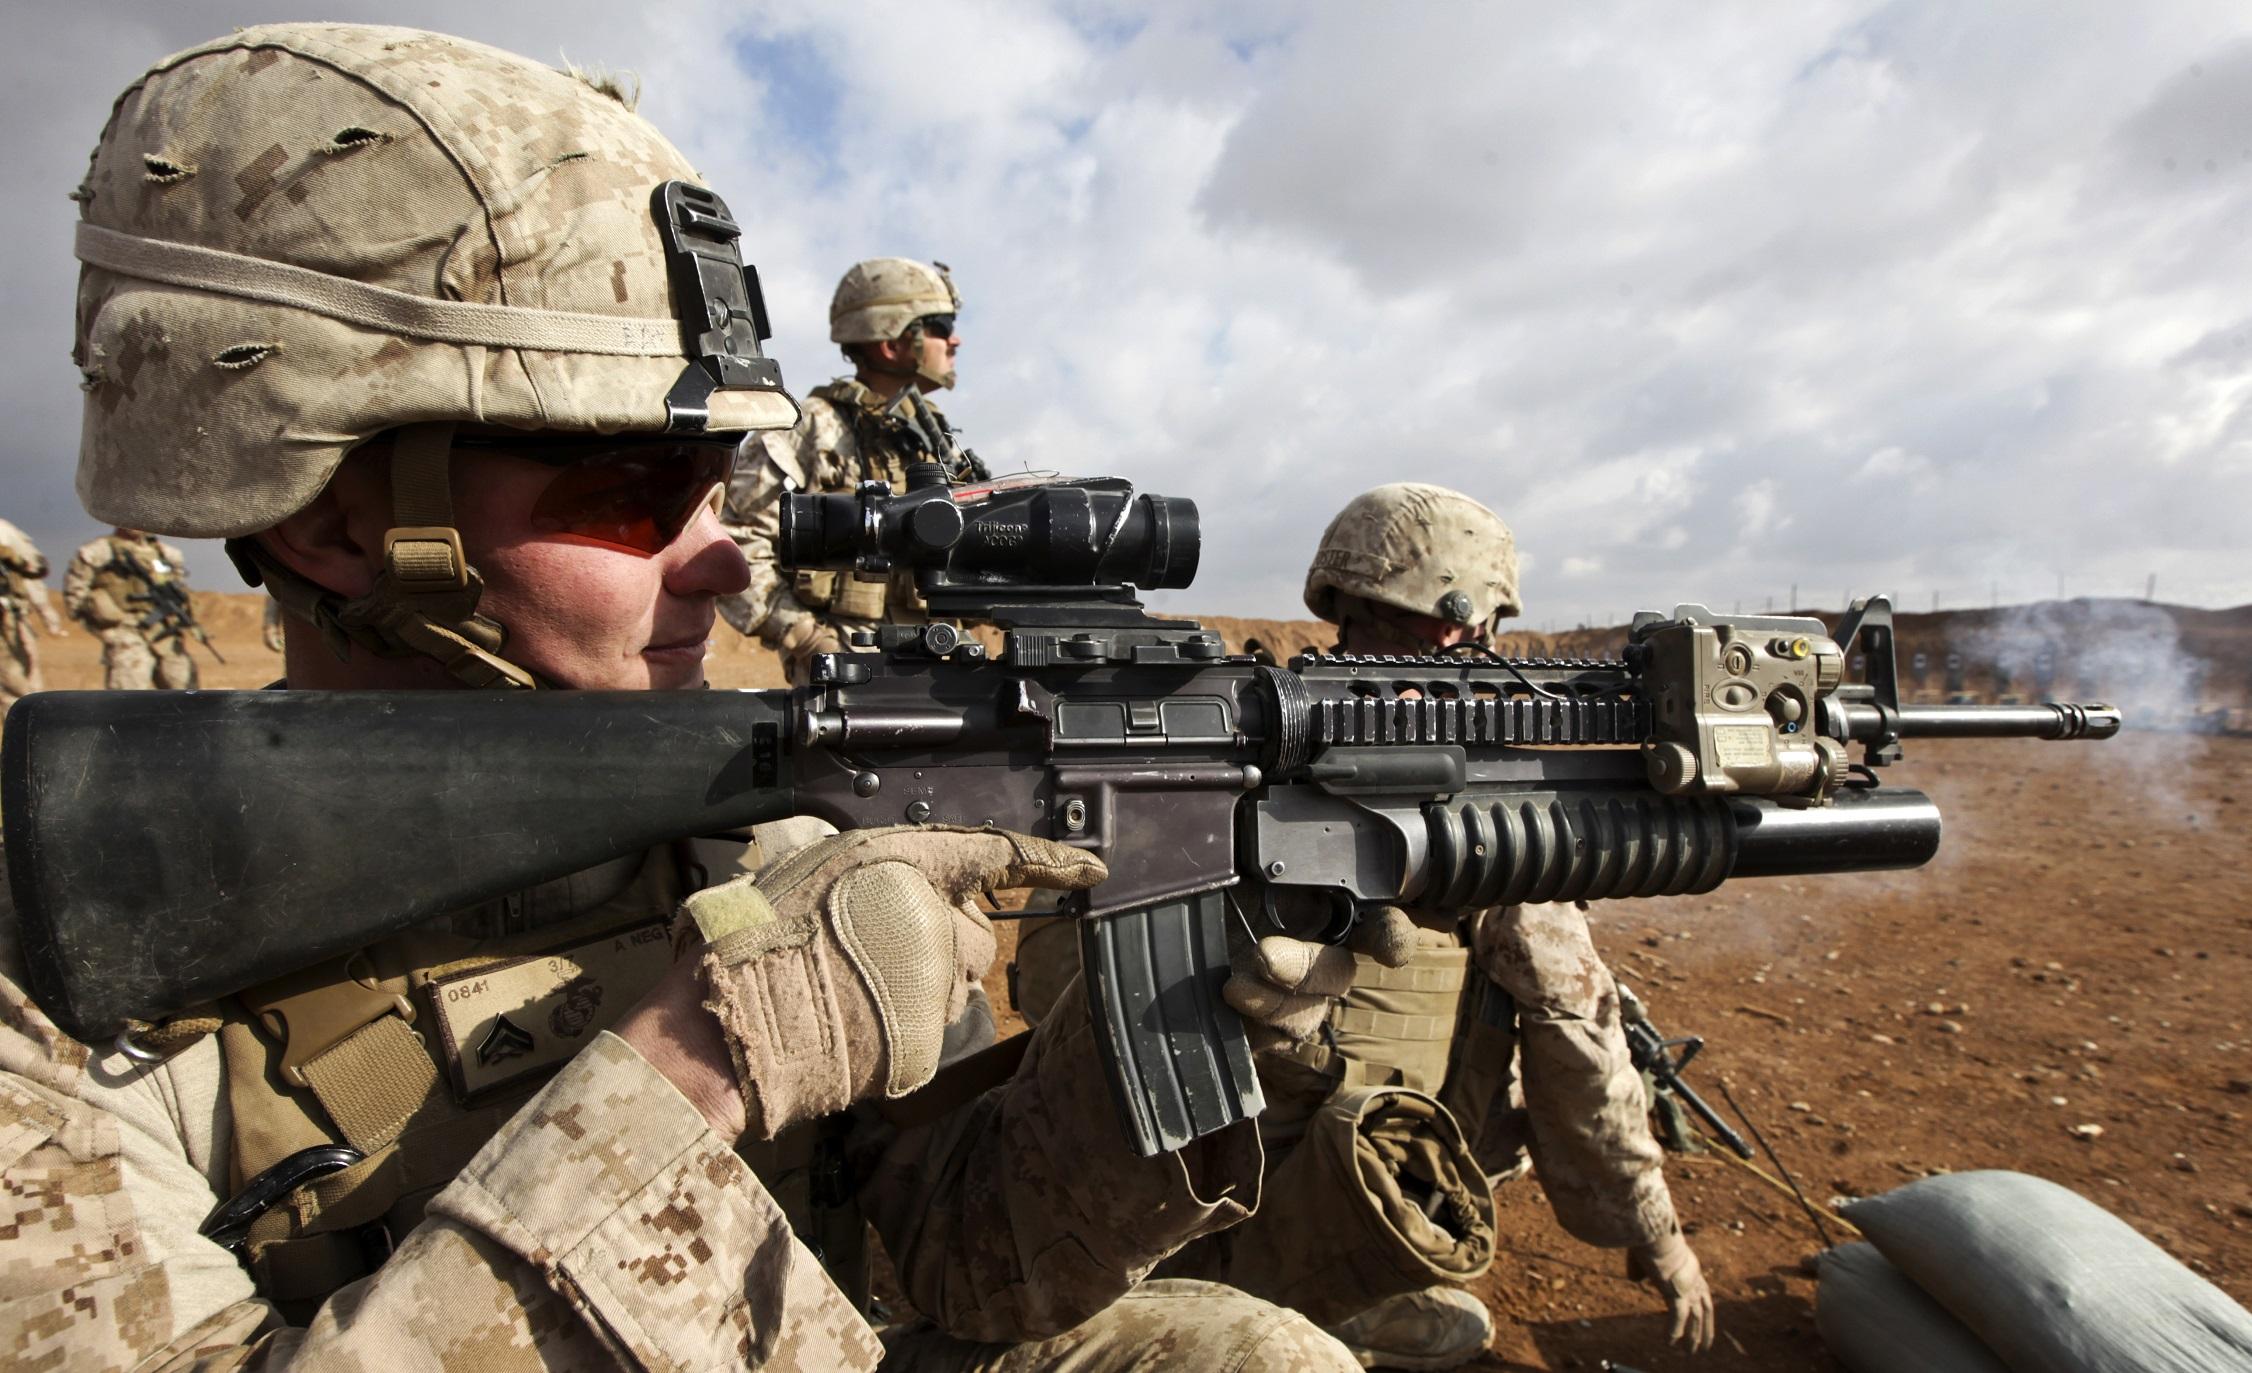 5 Best Handguns, Shotguns and Military Rifles on Planet